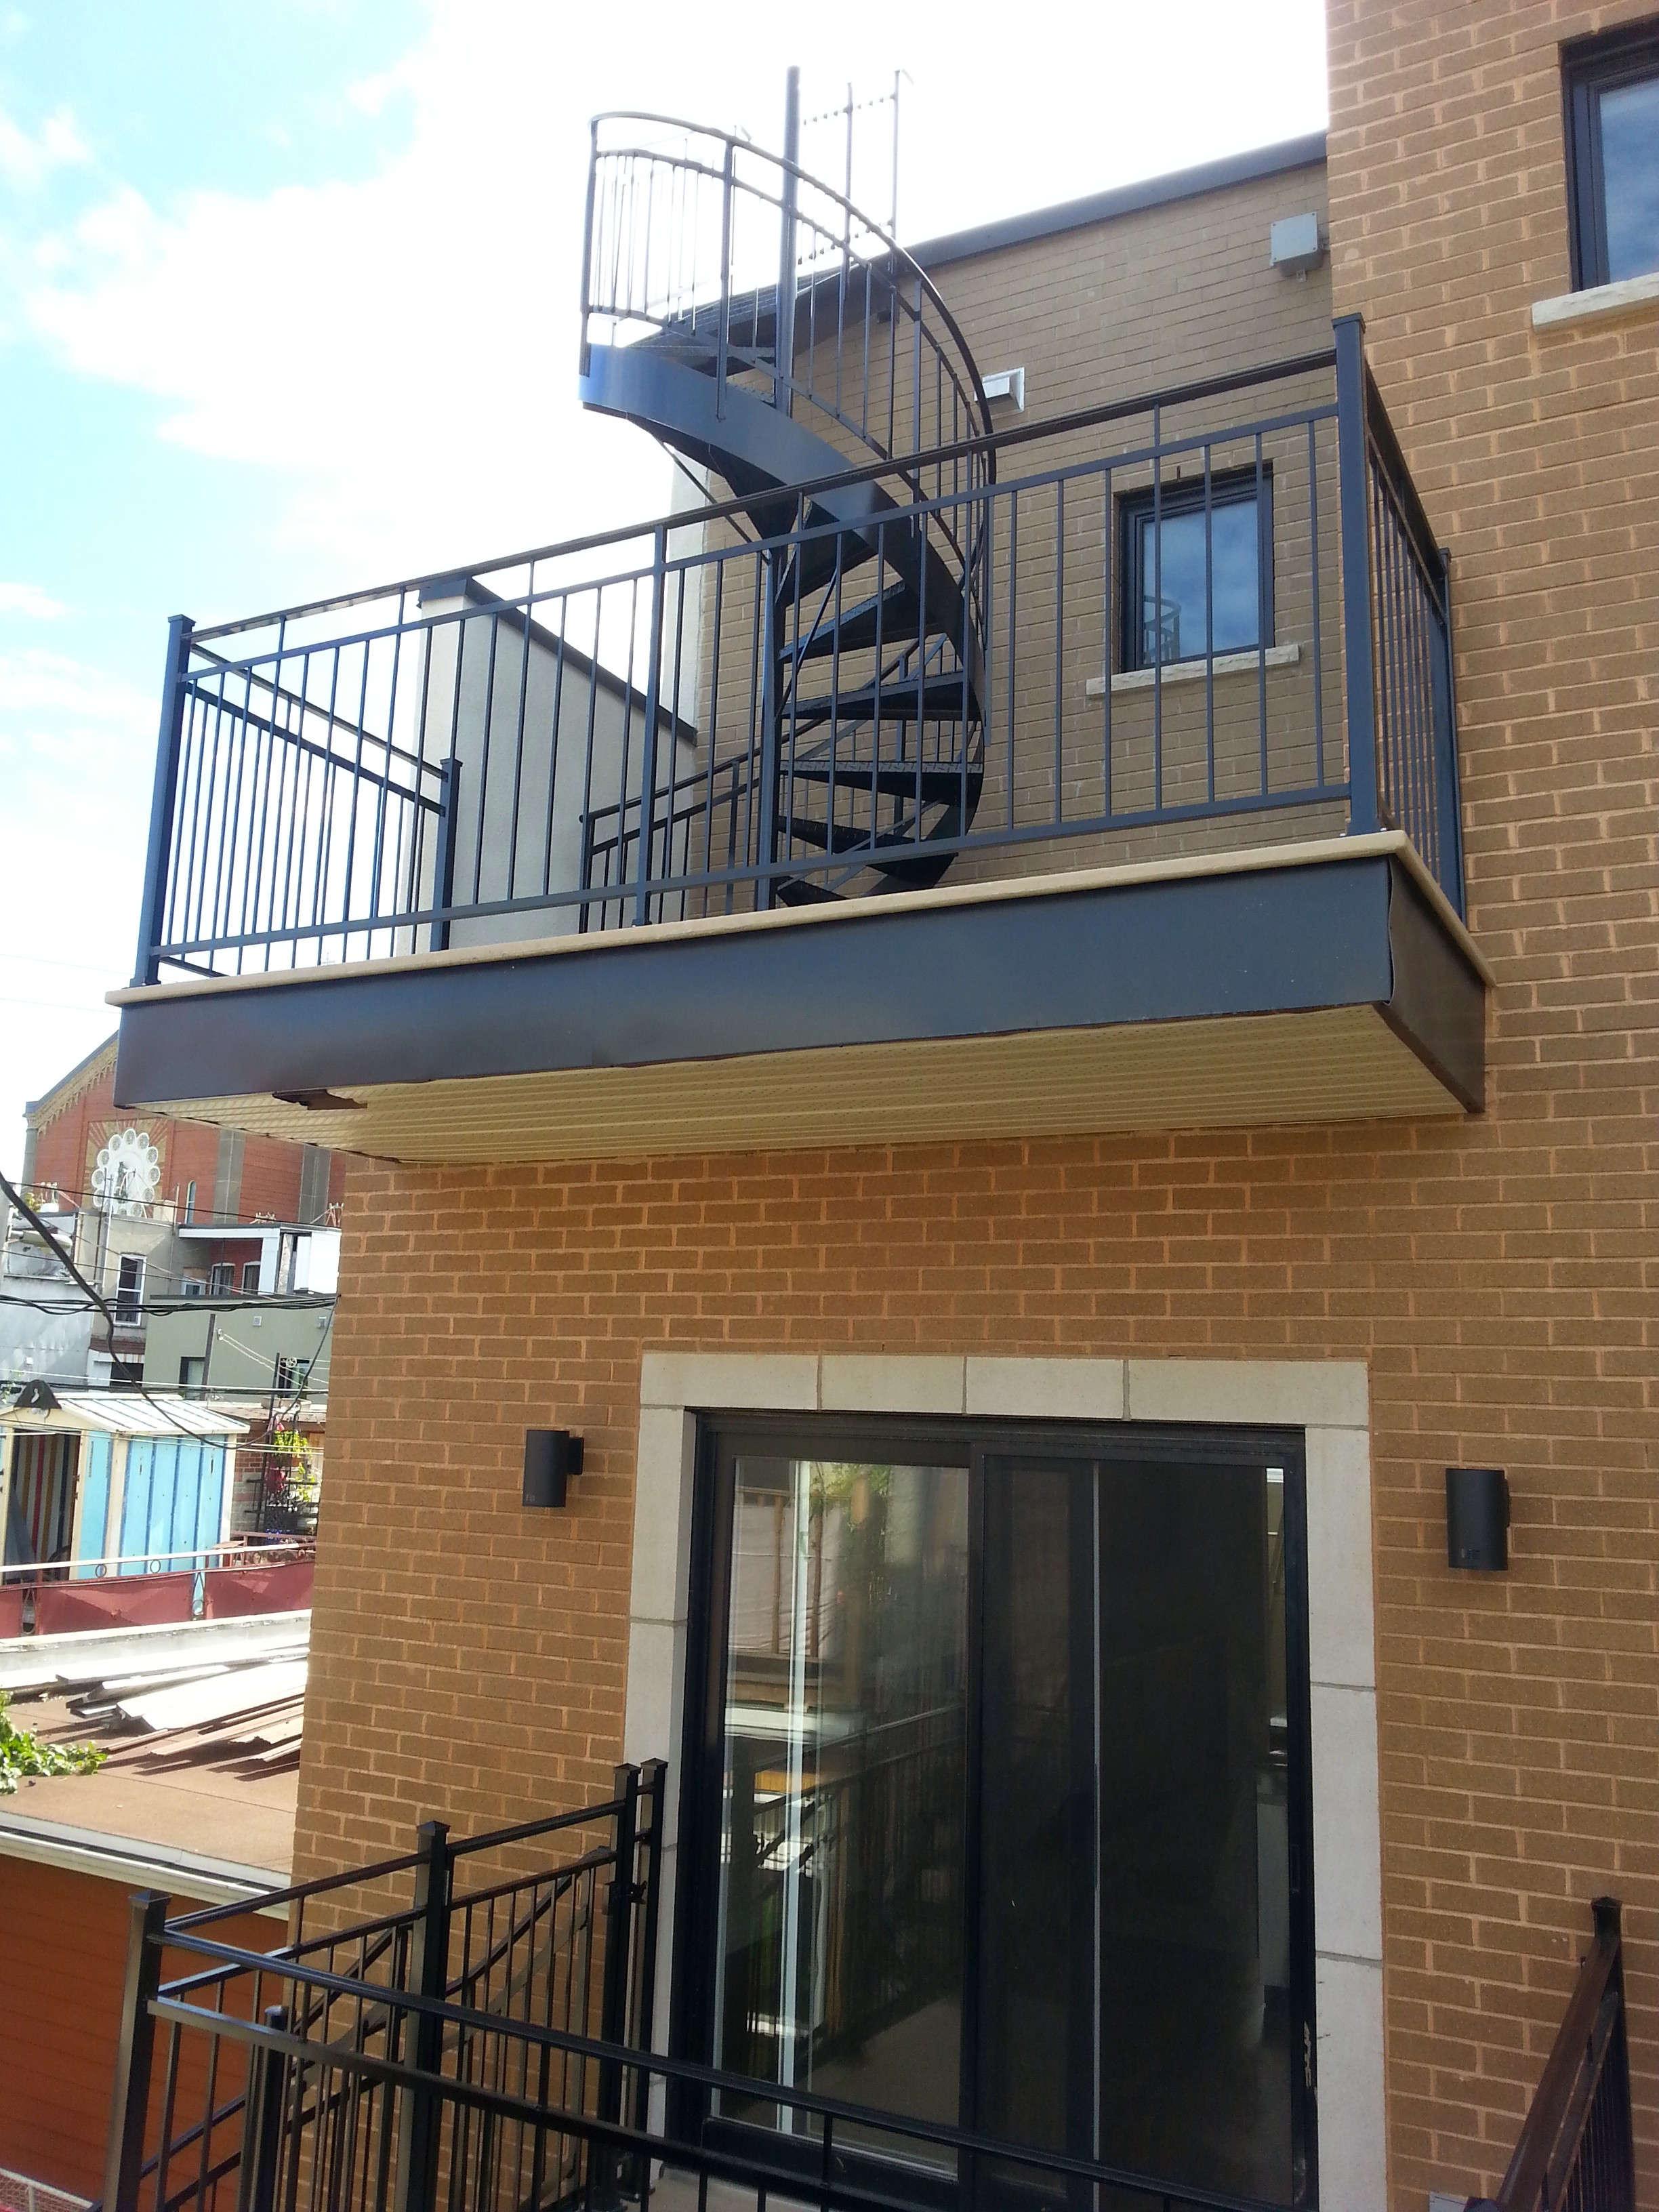 Auvent Balcon concernant auvents   balcons de fibre de verre et de balcons en aluminium